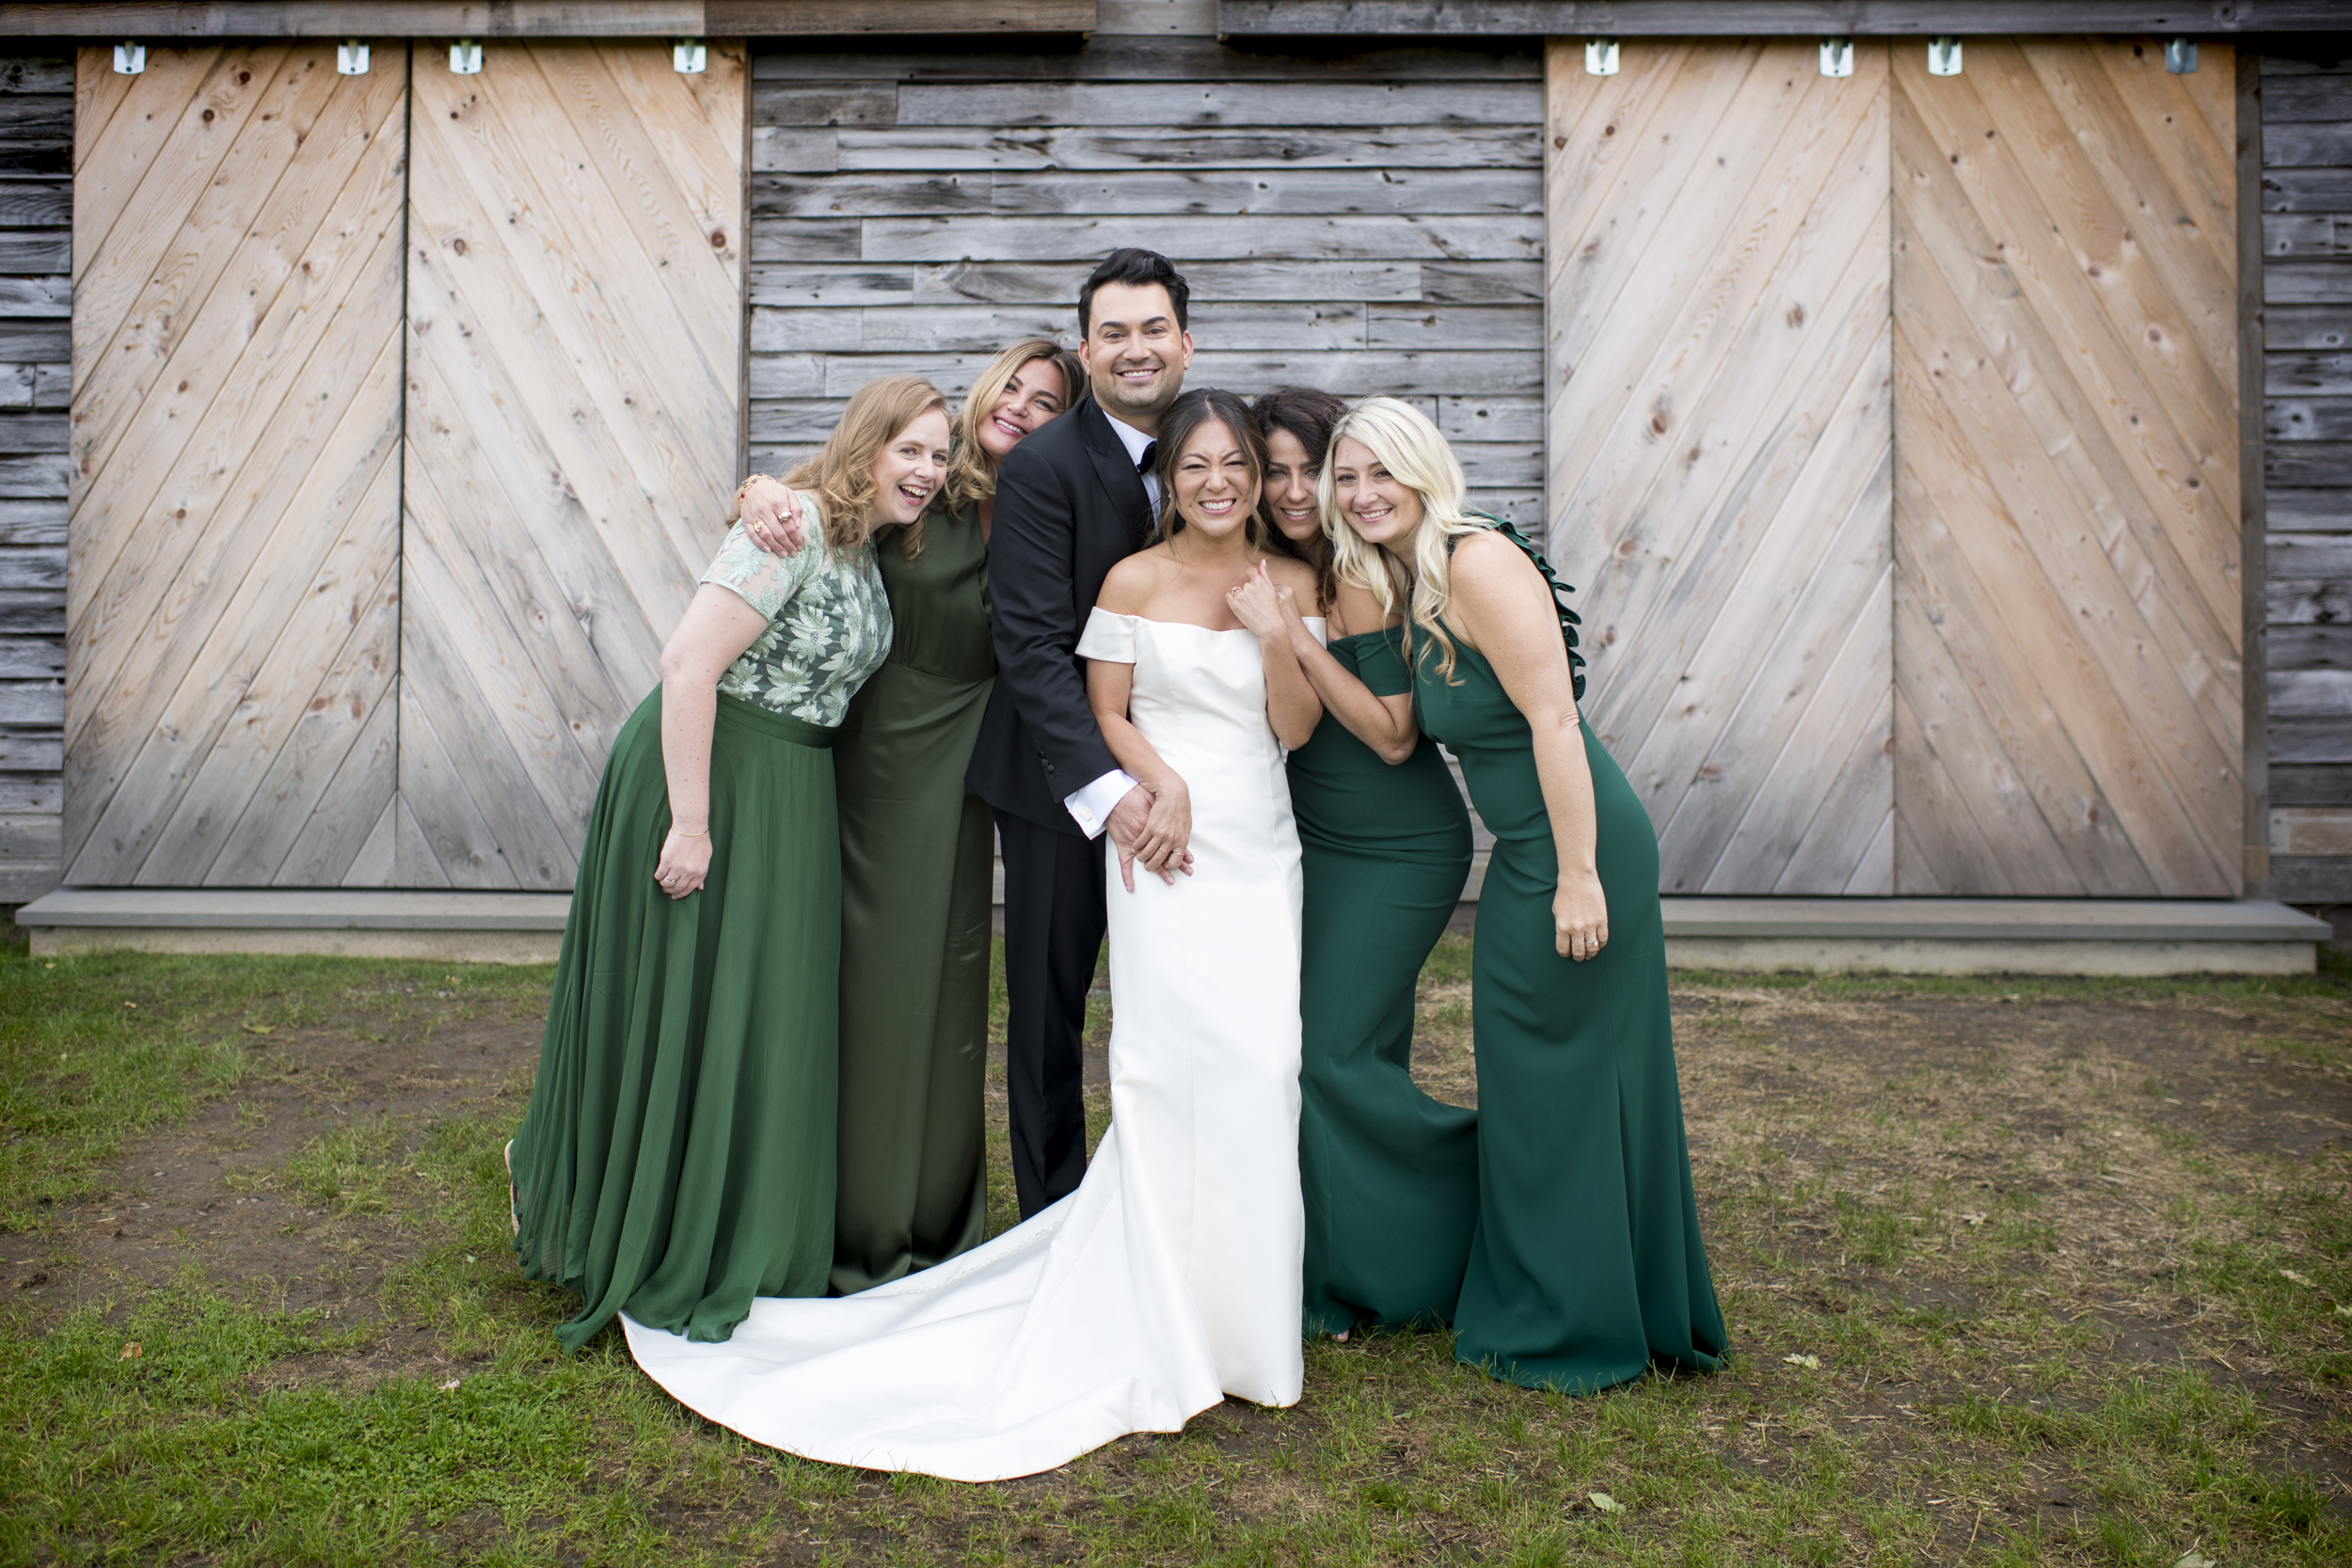 20180922_Brightsmith_CarolNick_Wedding_03648.jpg